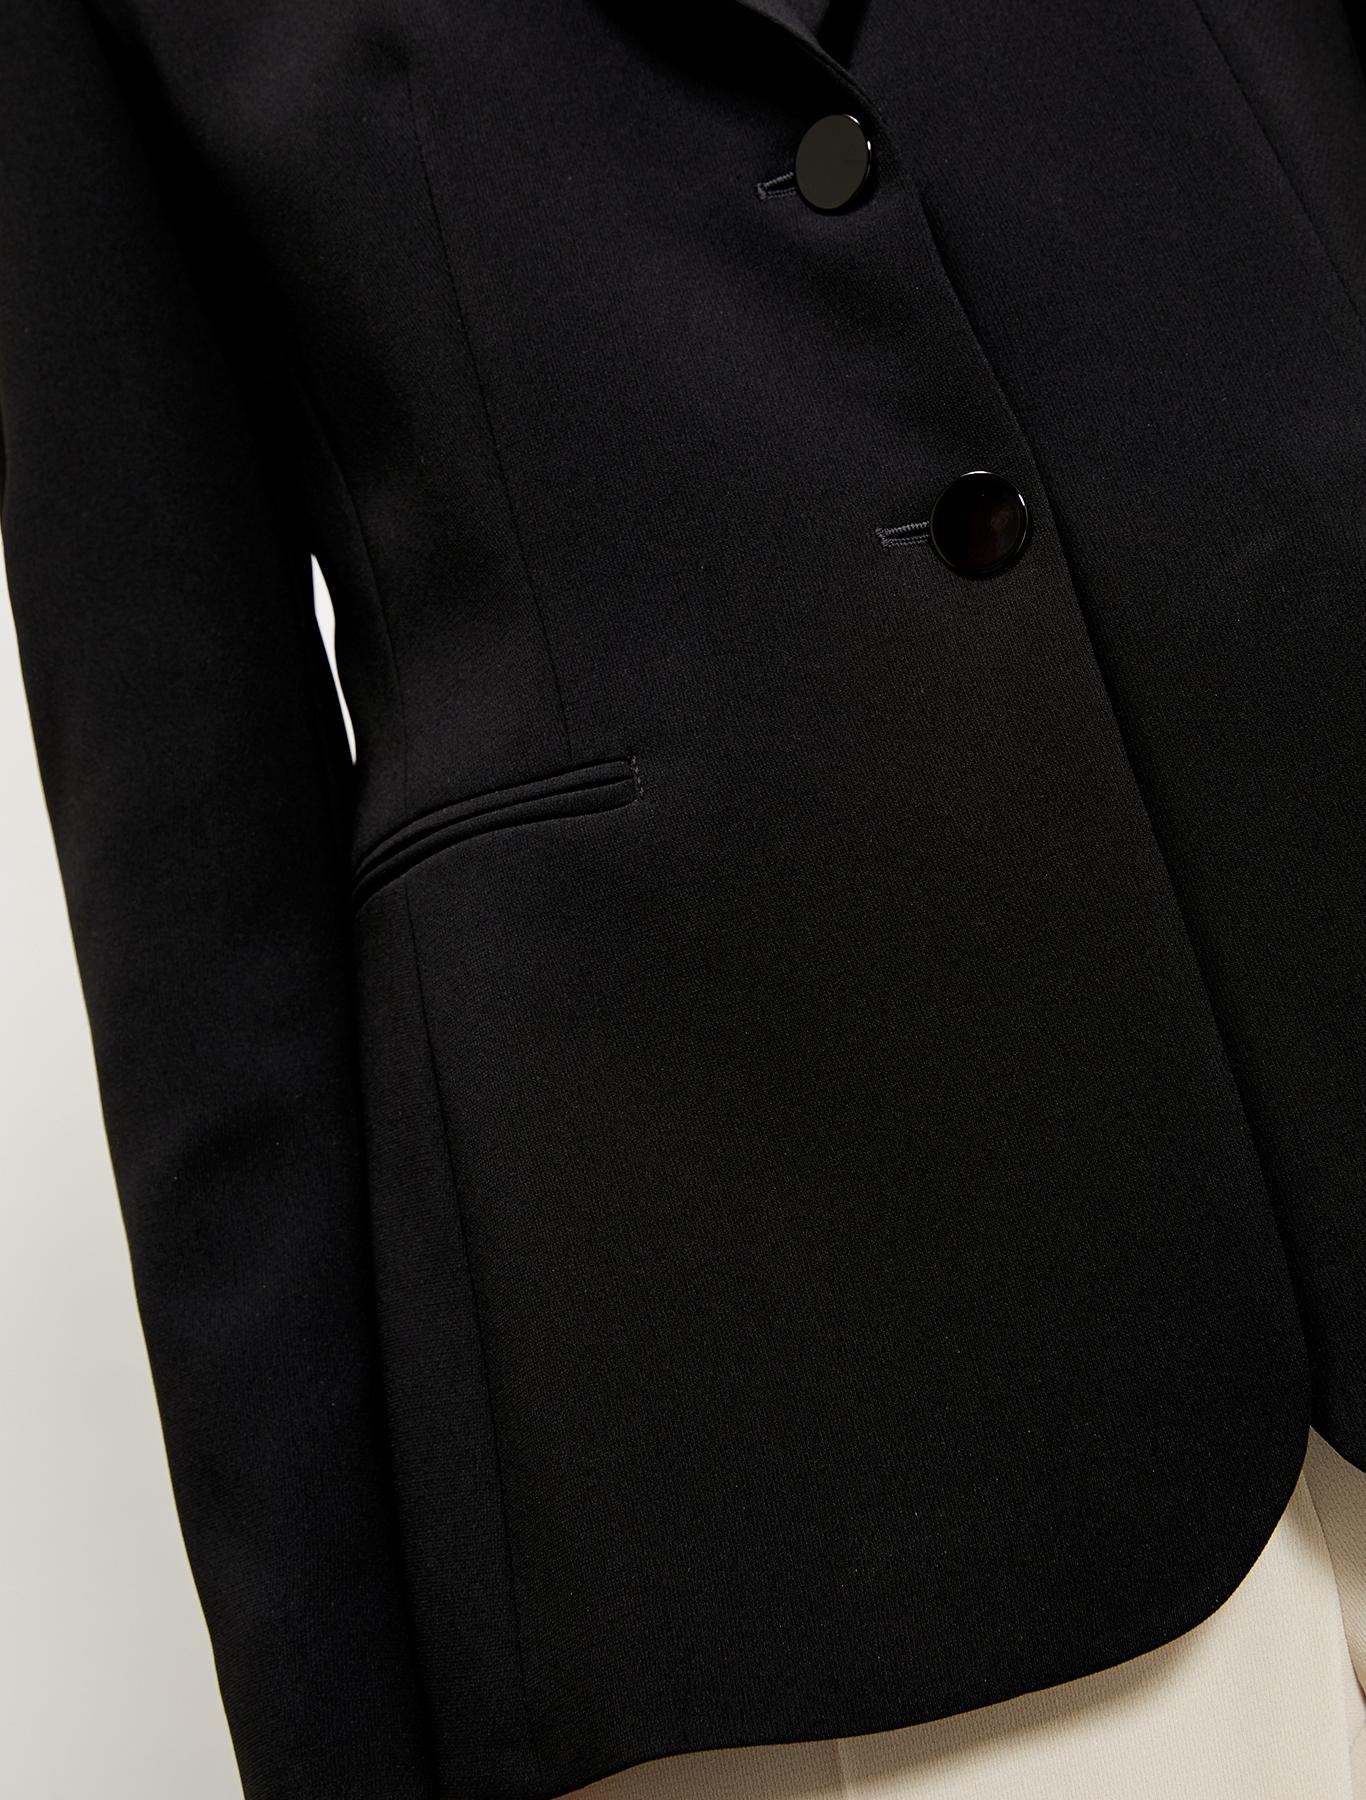 Blazer in flowing fabric - black - pennyblack